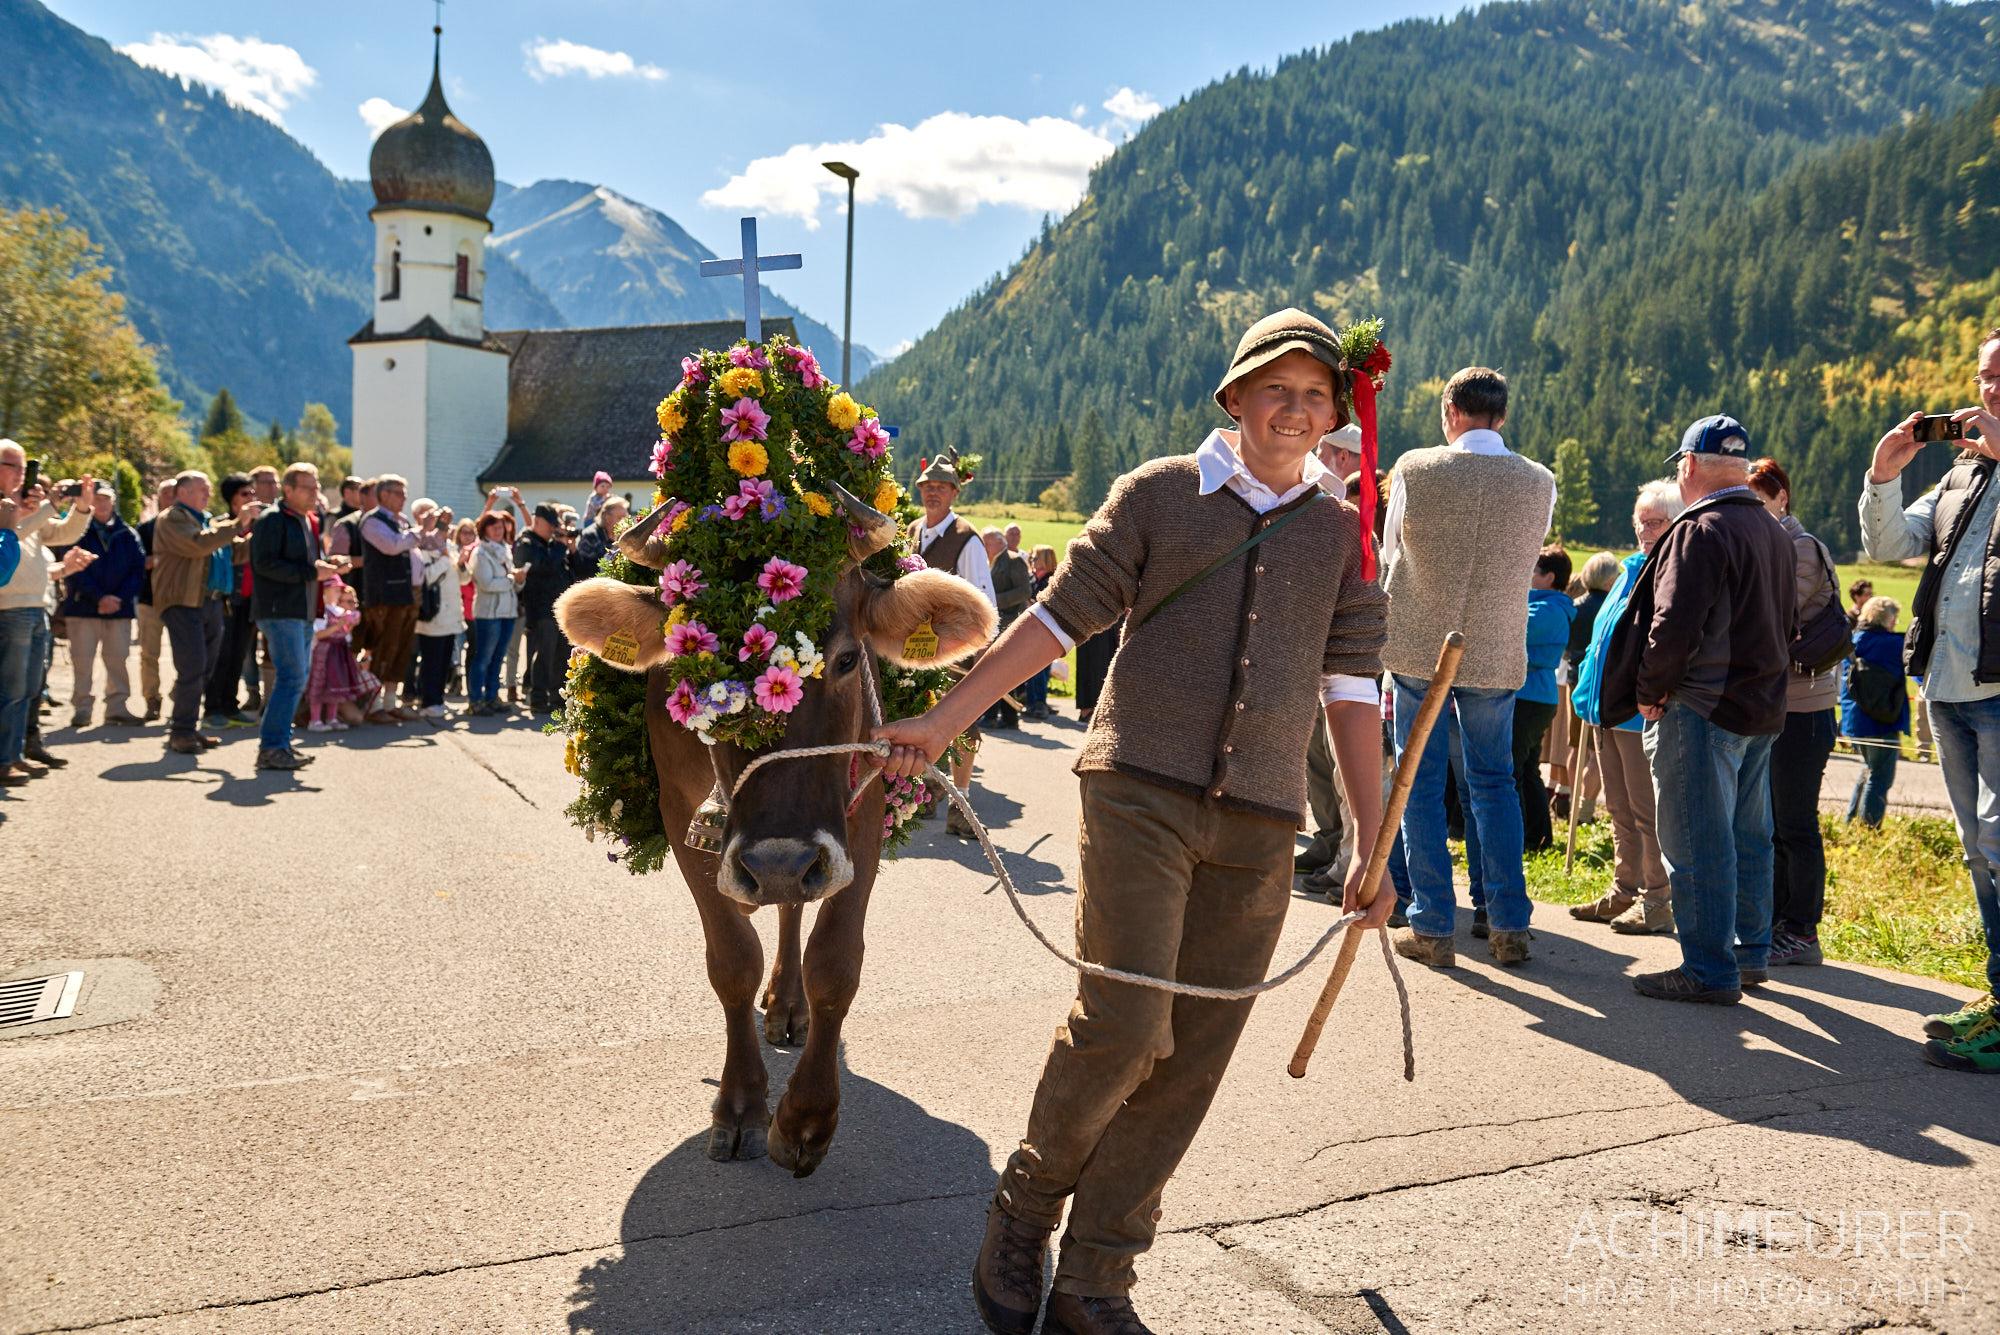 Almabtrieb Tannheim, Tannheimertal, Tirol, Österreich by Achim Meurer.